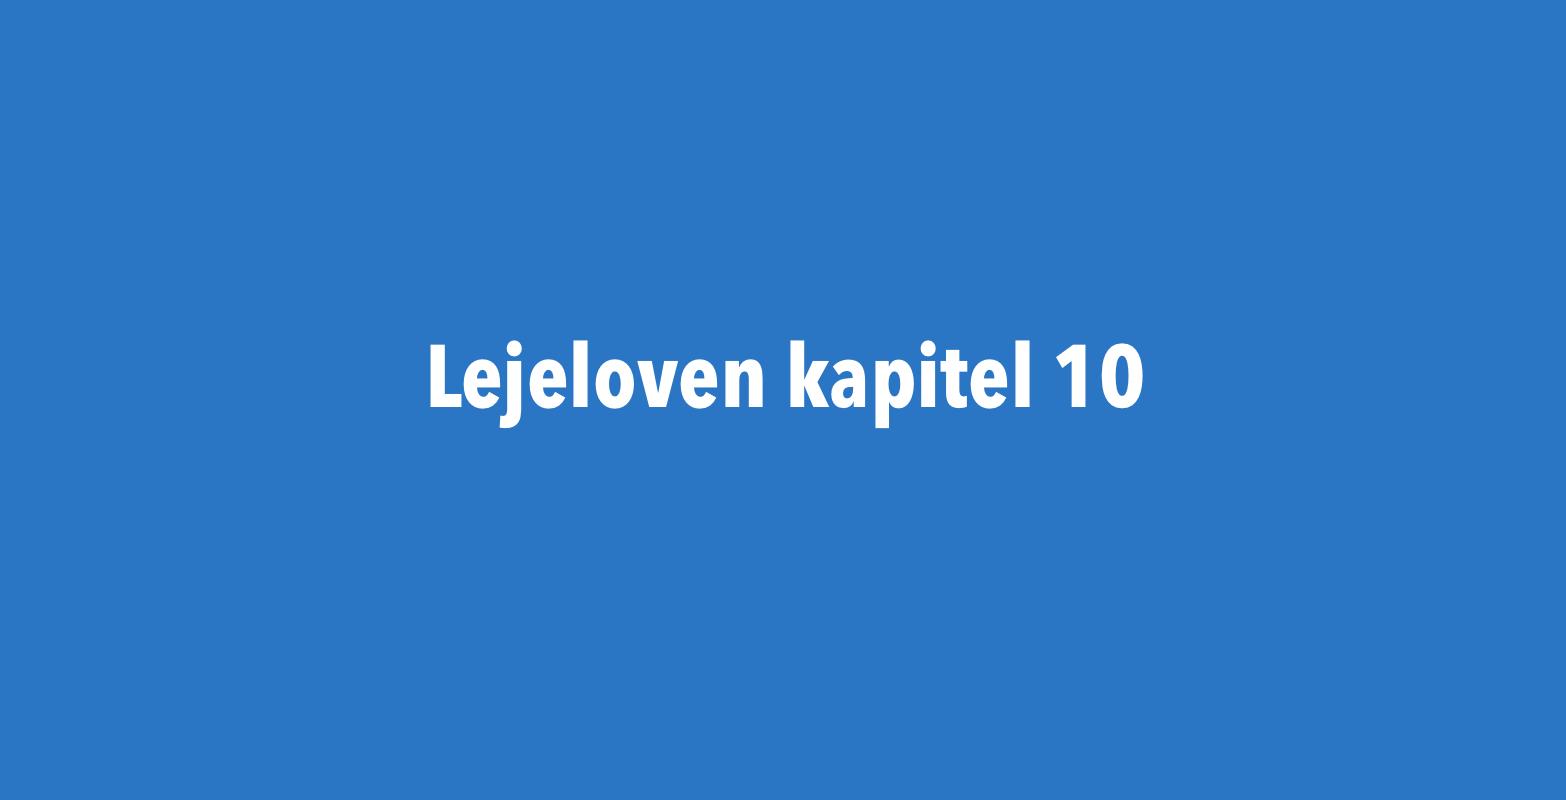 Lejelovens kapital 10